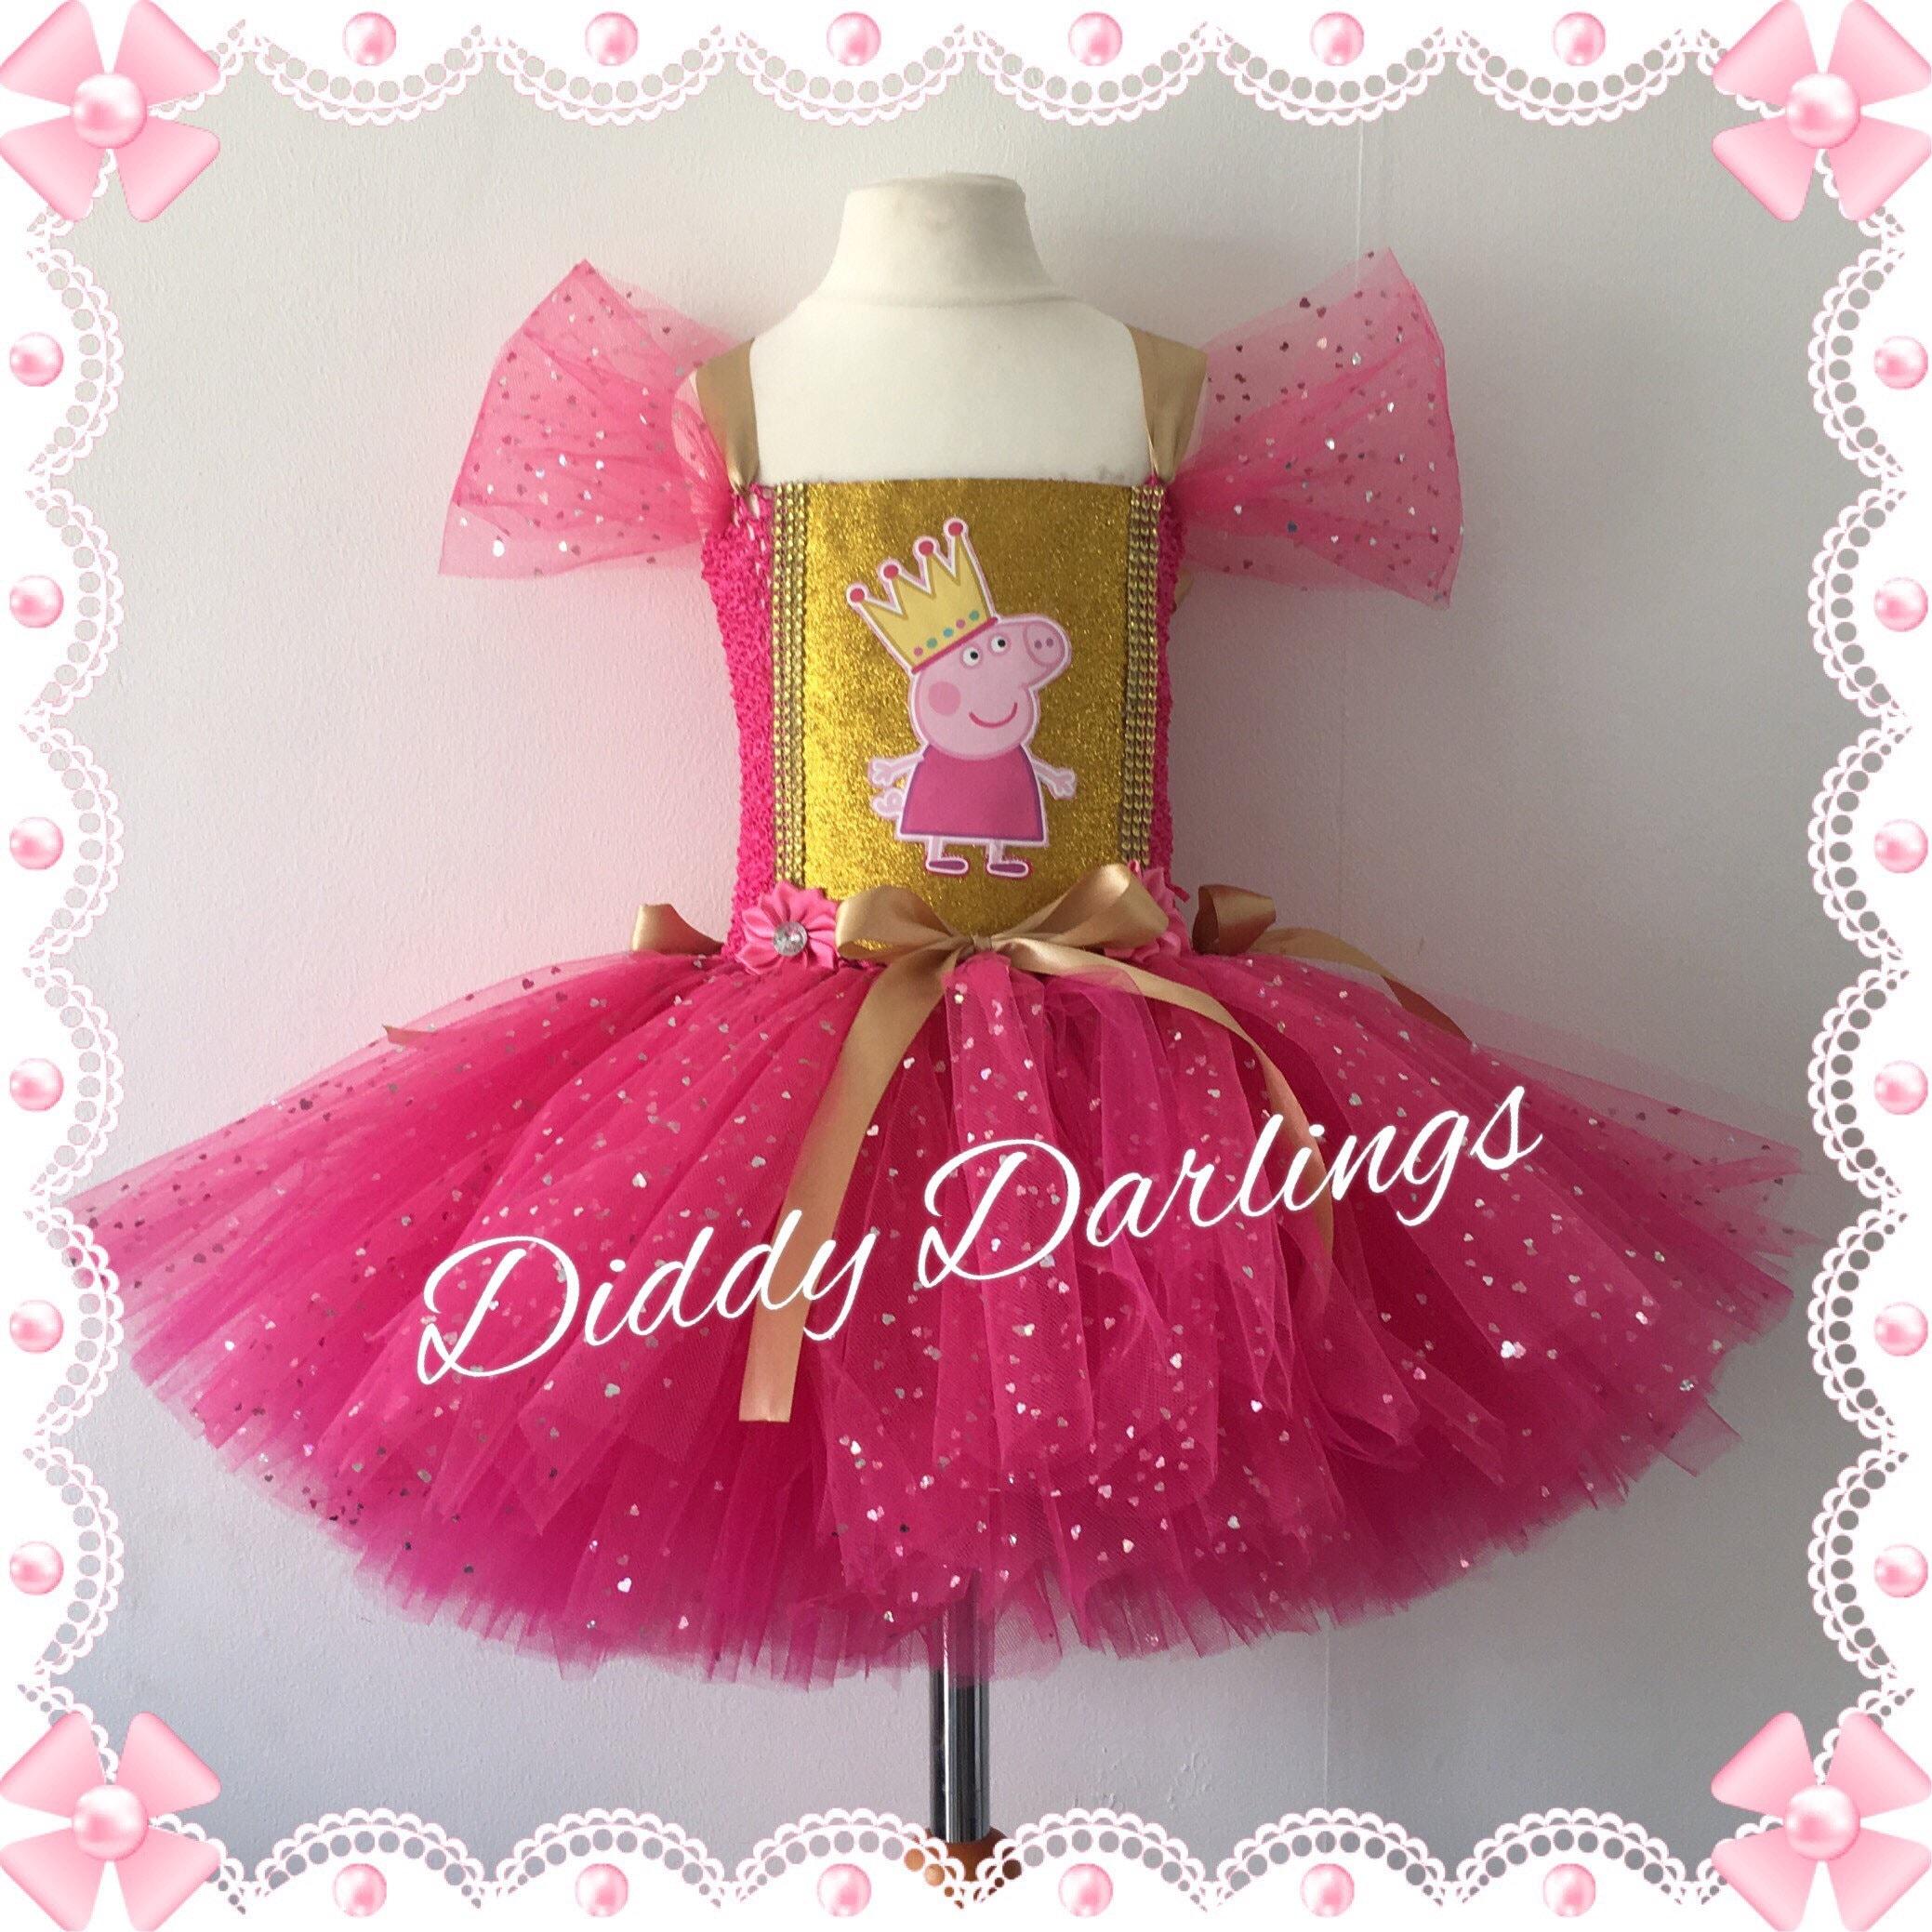 Sparkly Peppa Pig Tutu Dress Pink And Gold Tutu Dress Peppa